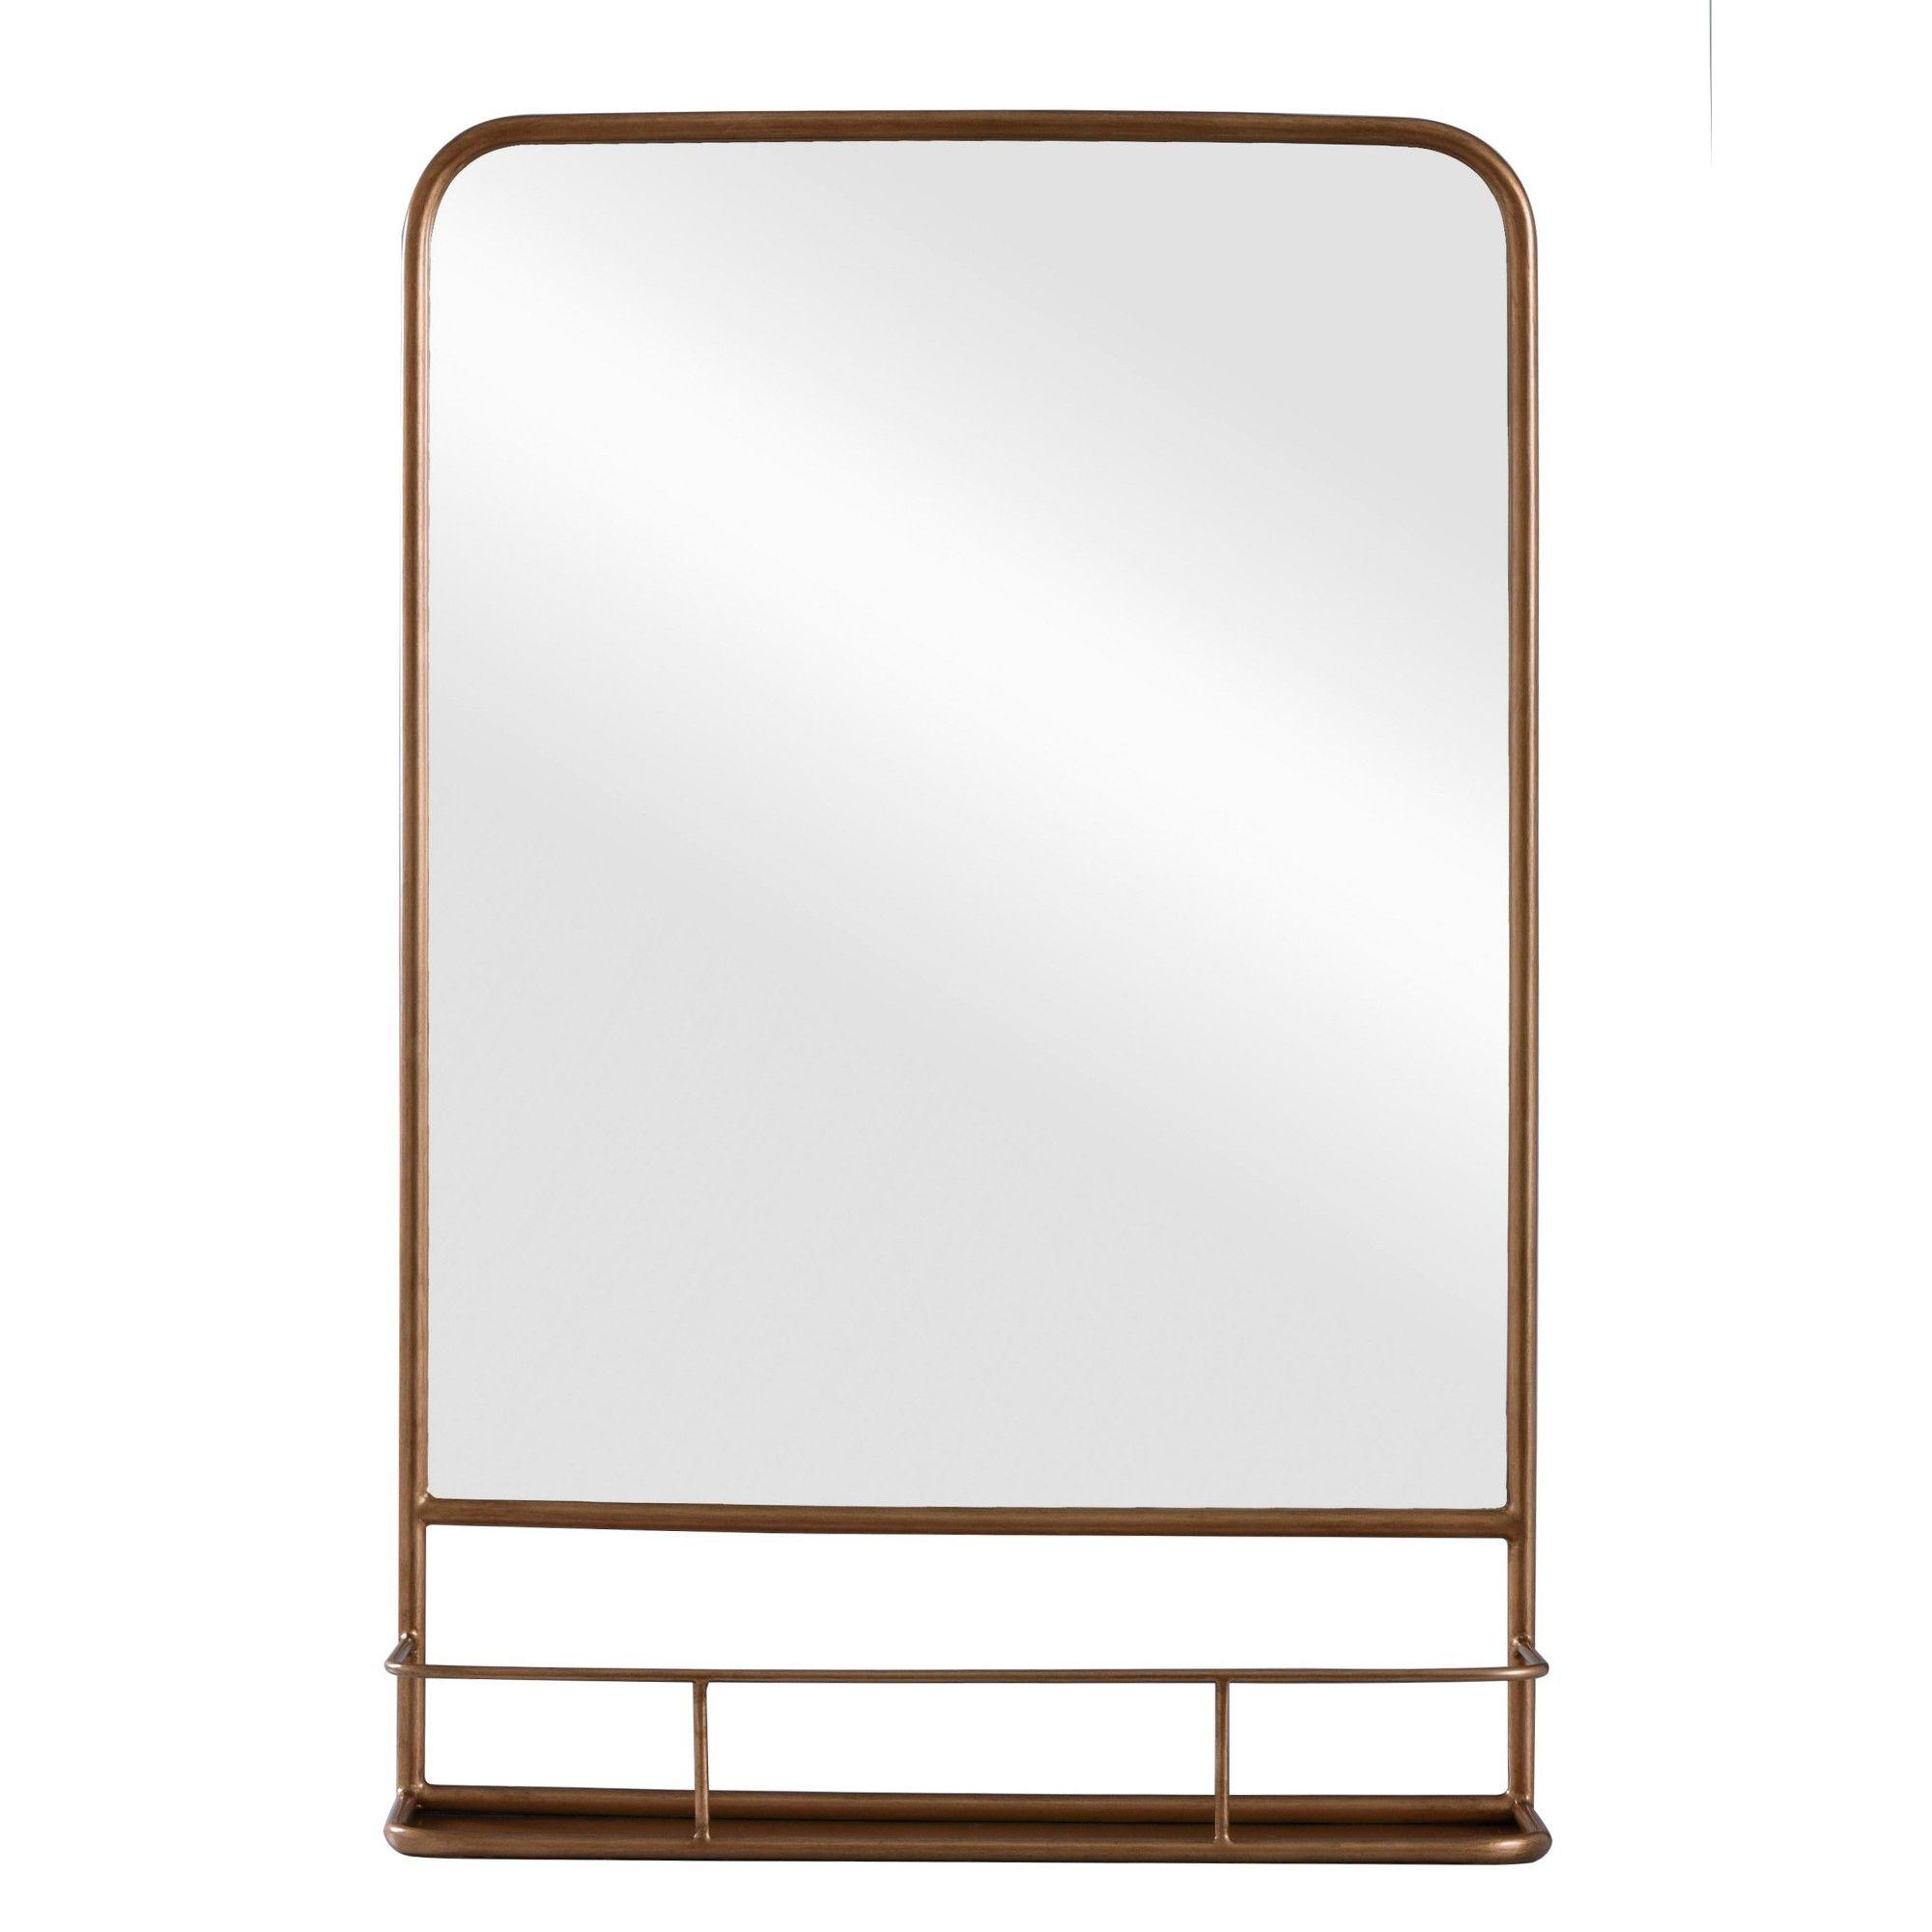 20 X 30 Pharmacy Mirror With Metal Shelf Powder Coated Mirror Brass Threshold Metal Shelves Bathroom Mirror With Shelf Mirror With Shelf